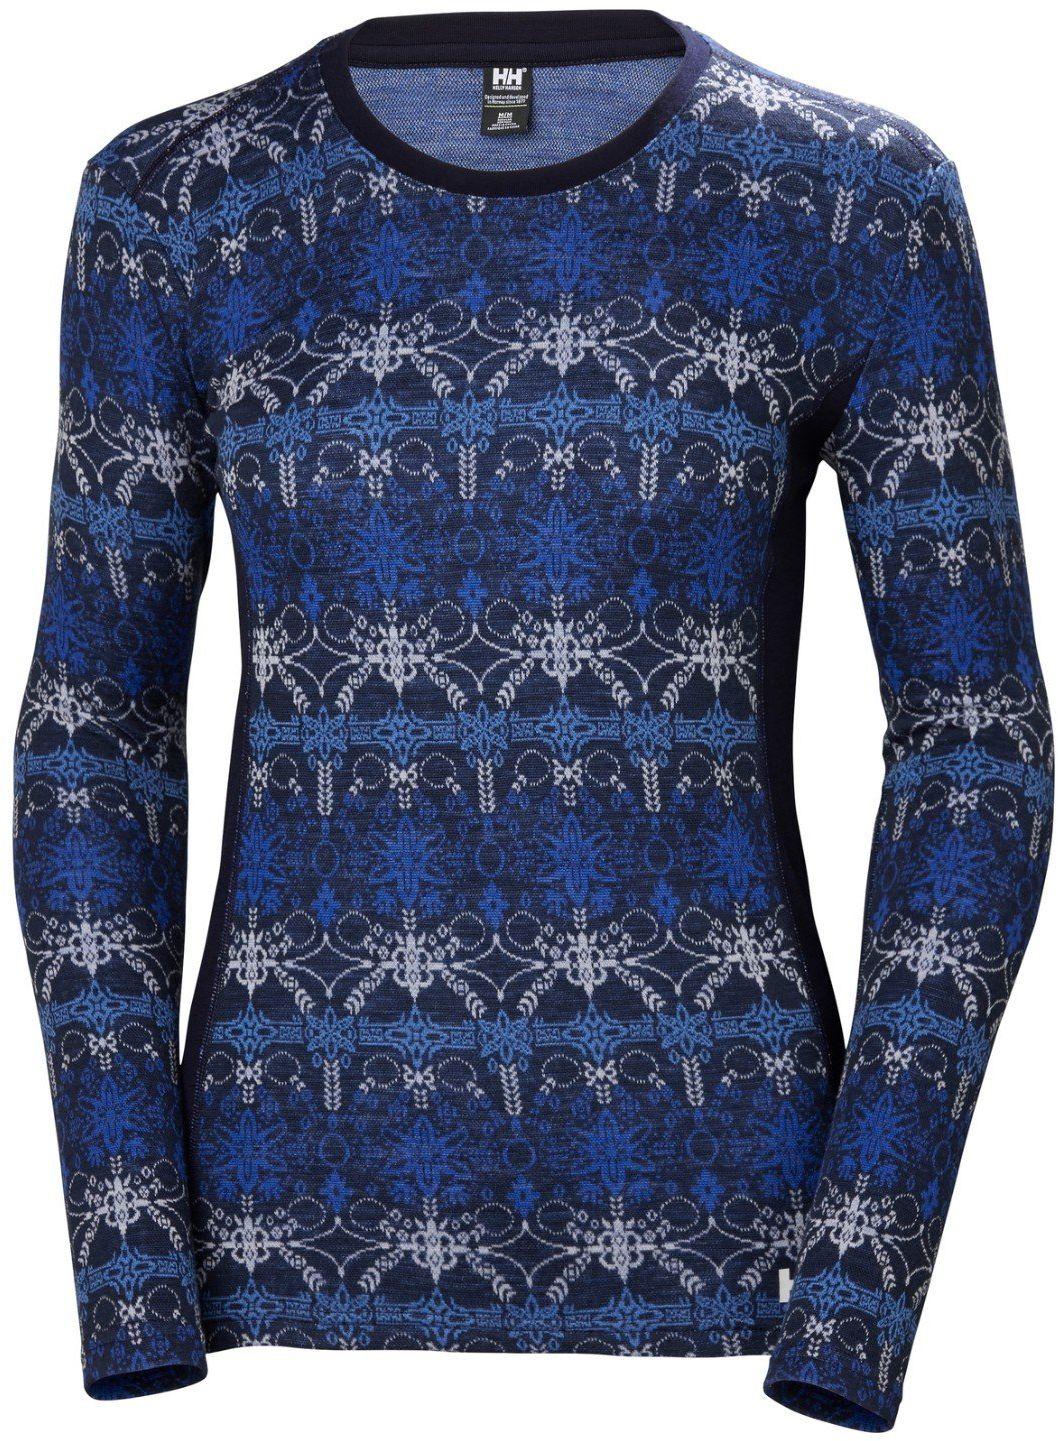 Hellyhansen damska bluza z nadrukiem Merino Mid Navy/Frost, XL